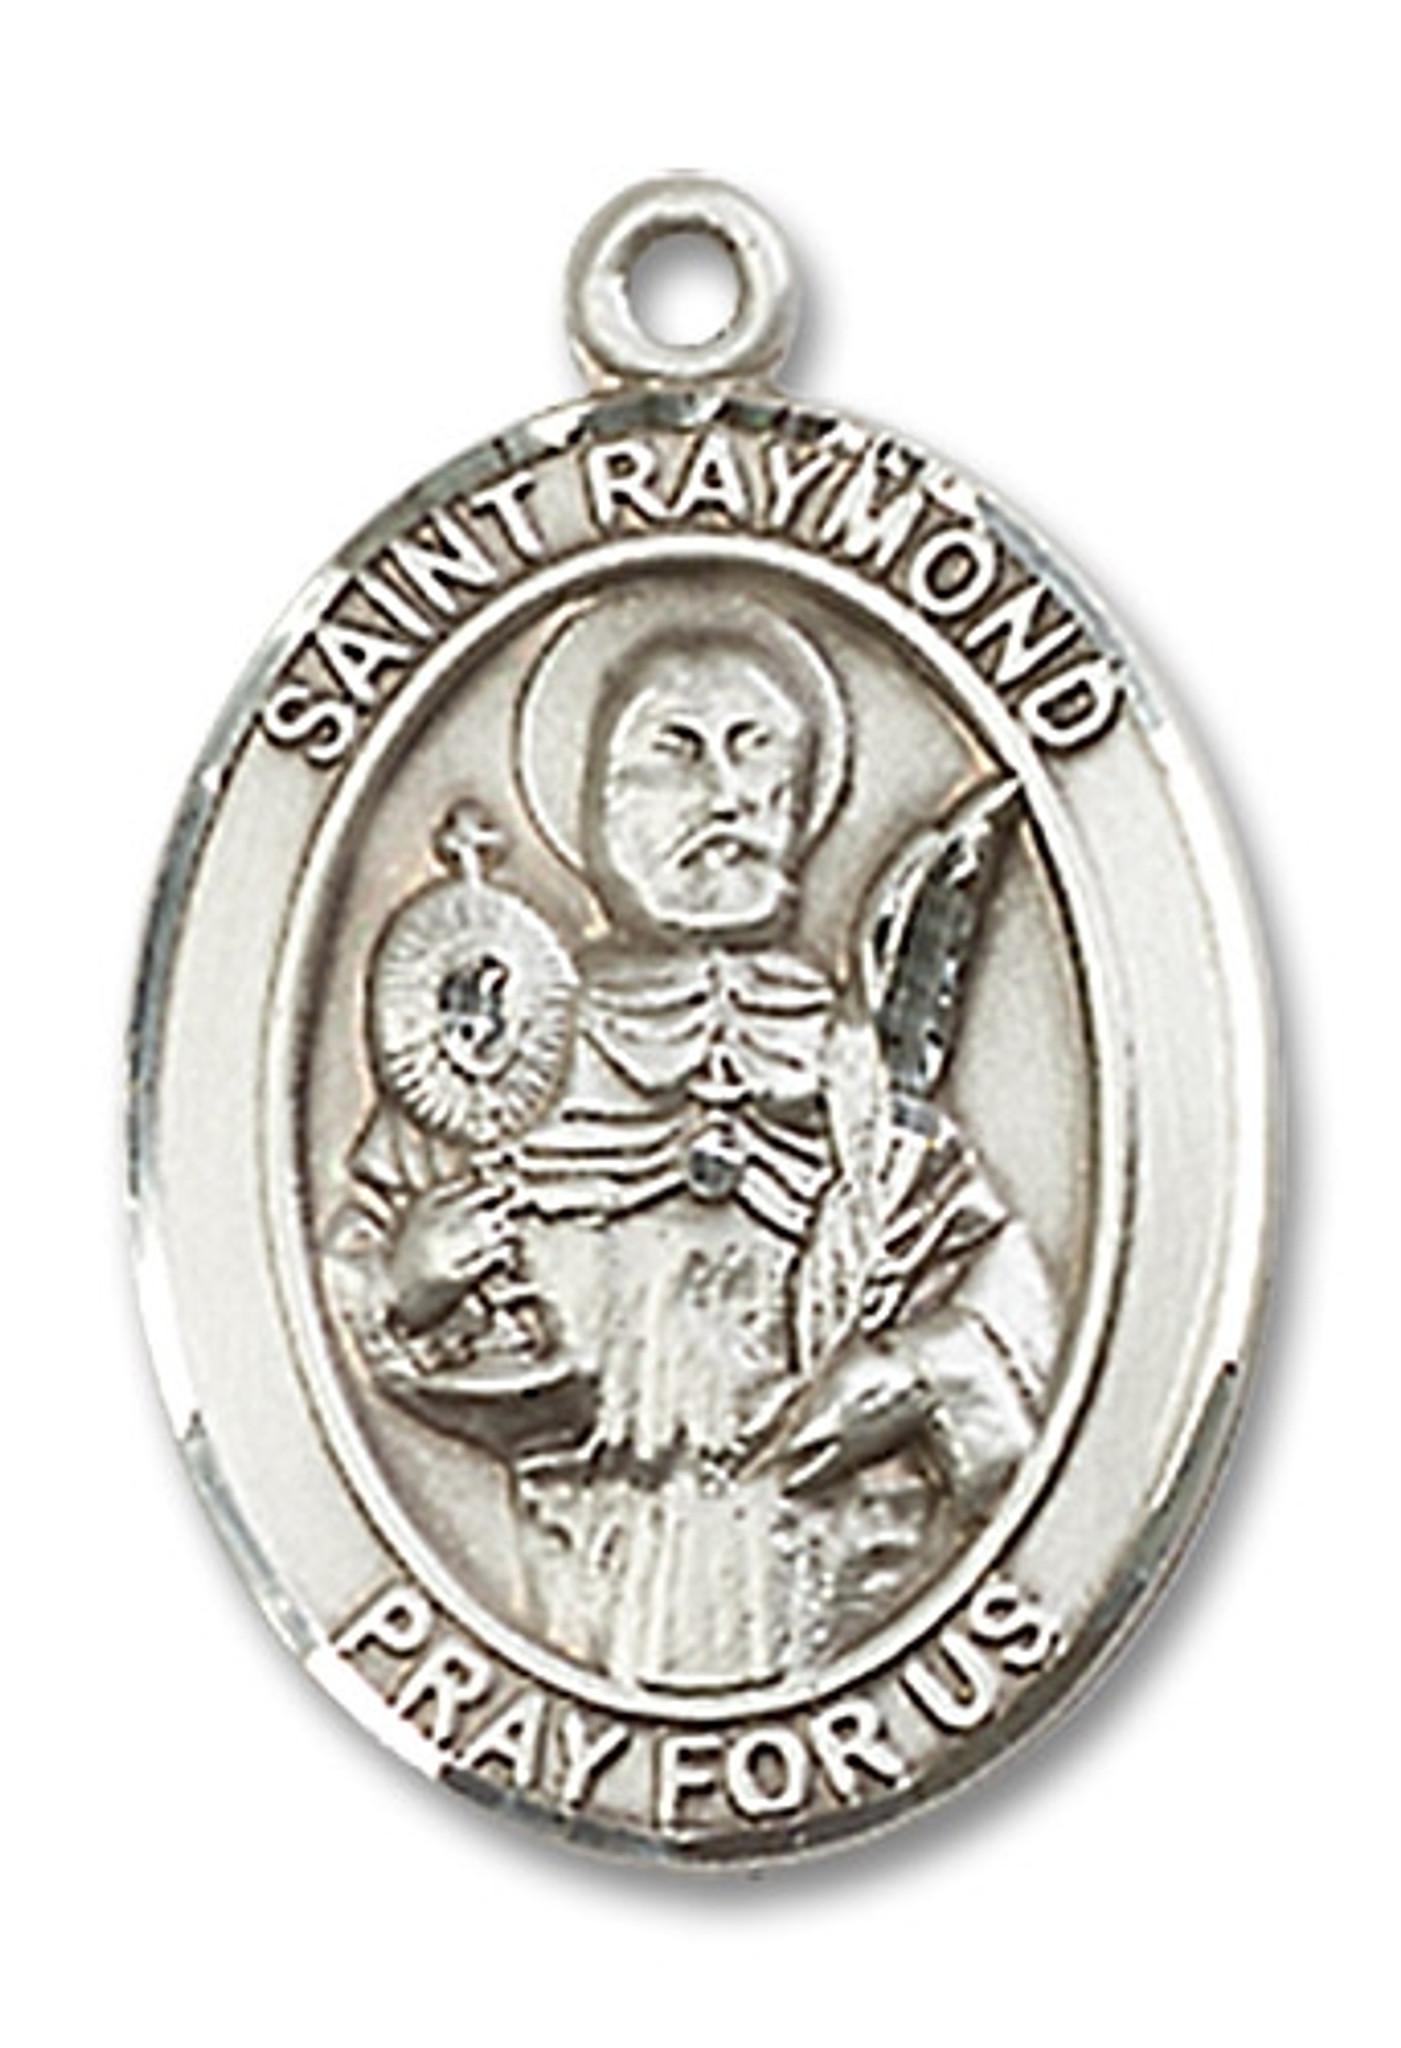 Raymond Nonnatus